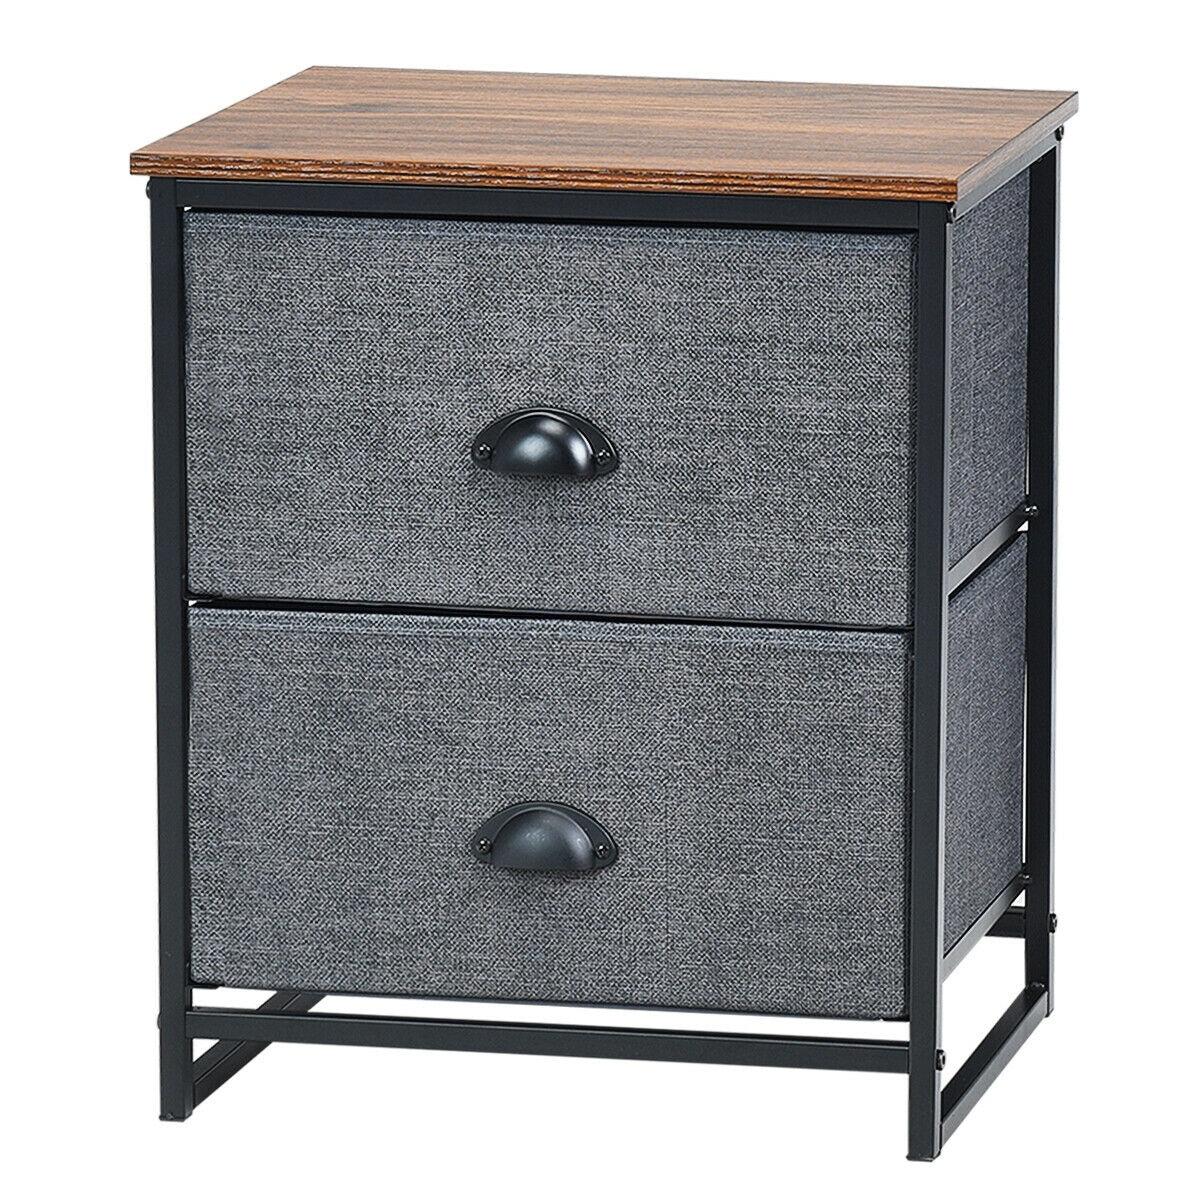 Gymax 2 Drawers Nightstand Side Table Storage Unit Display Metal Frame Dorm Room Black